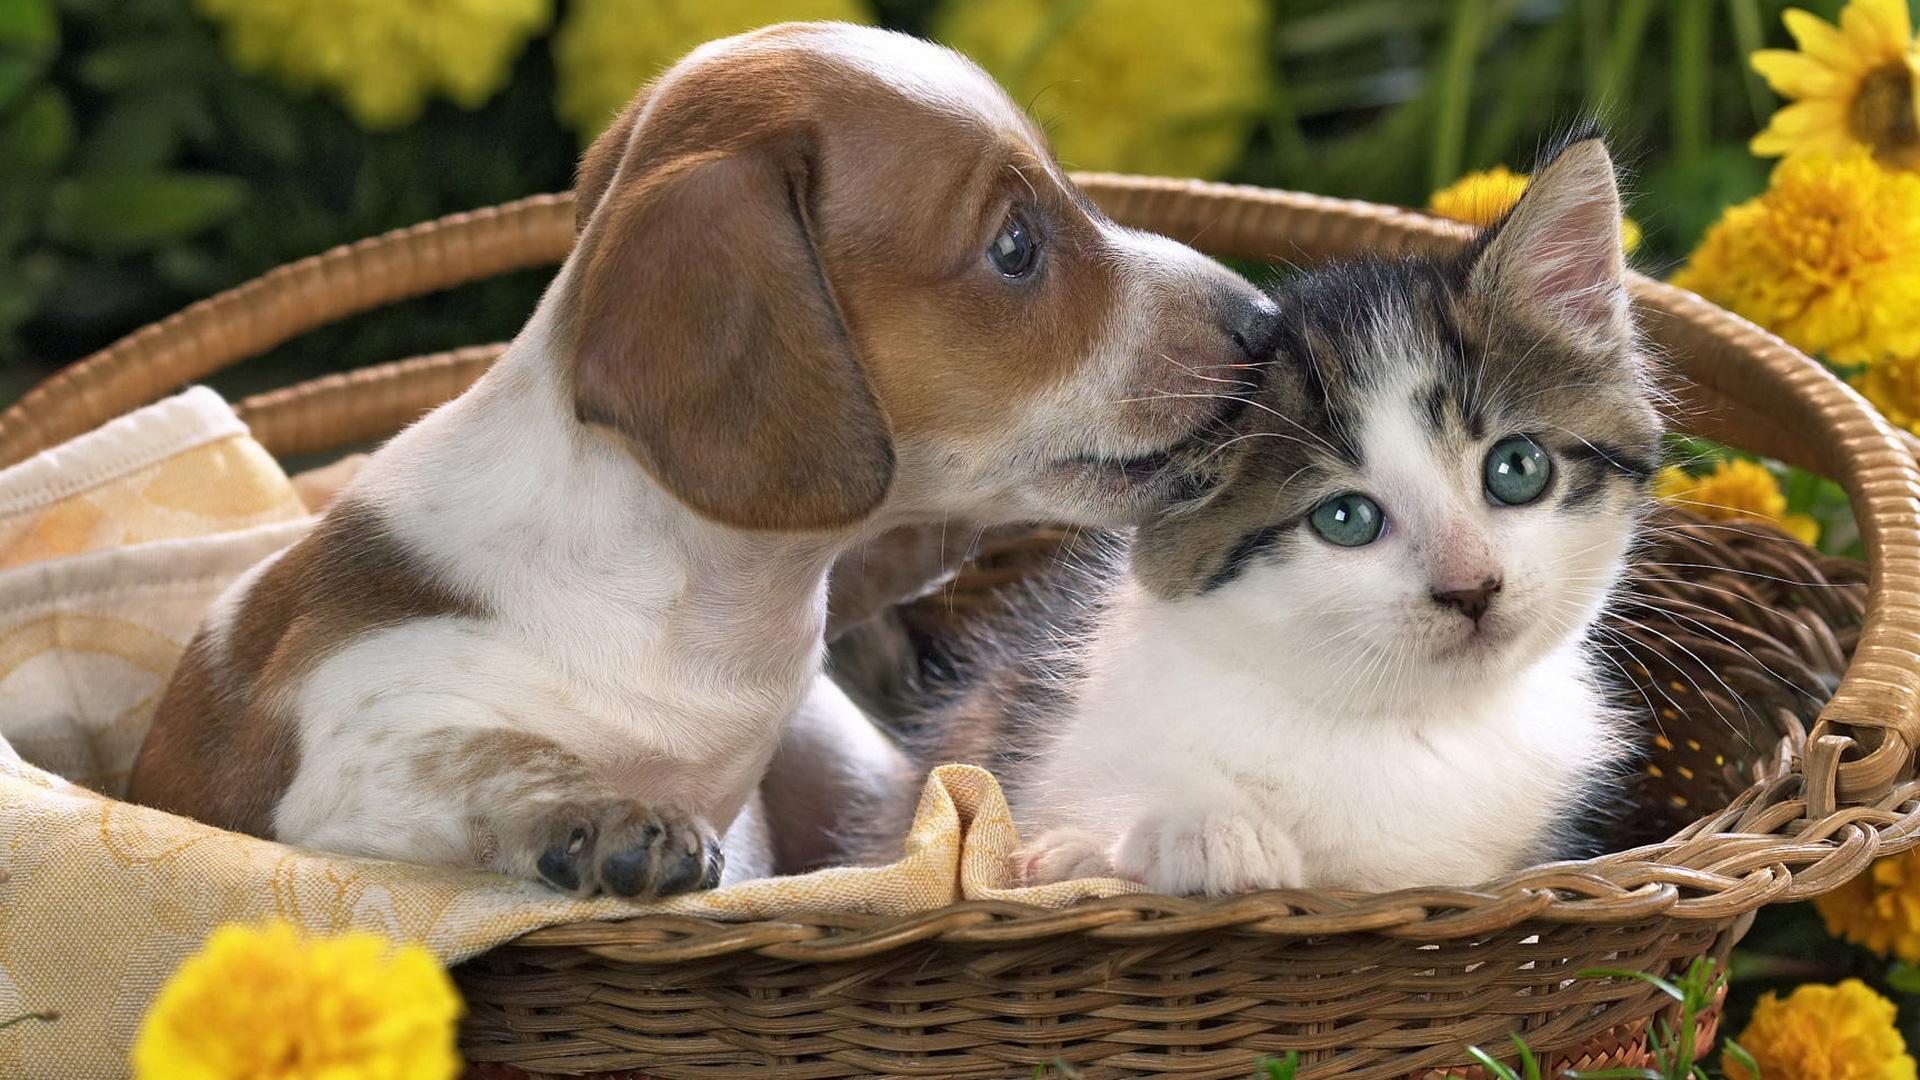 Puppy And Kitten   1920x1080   169 1920x1080